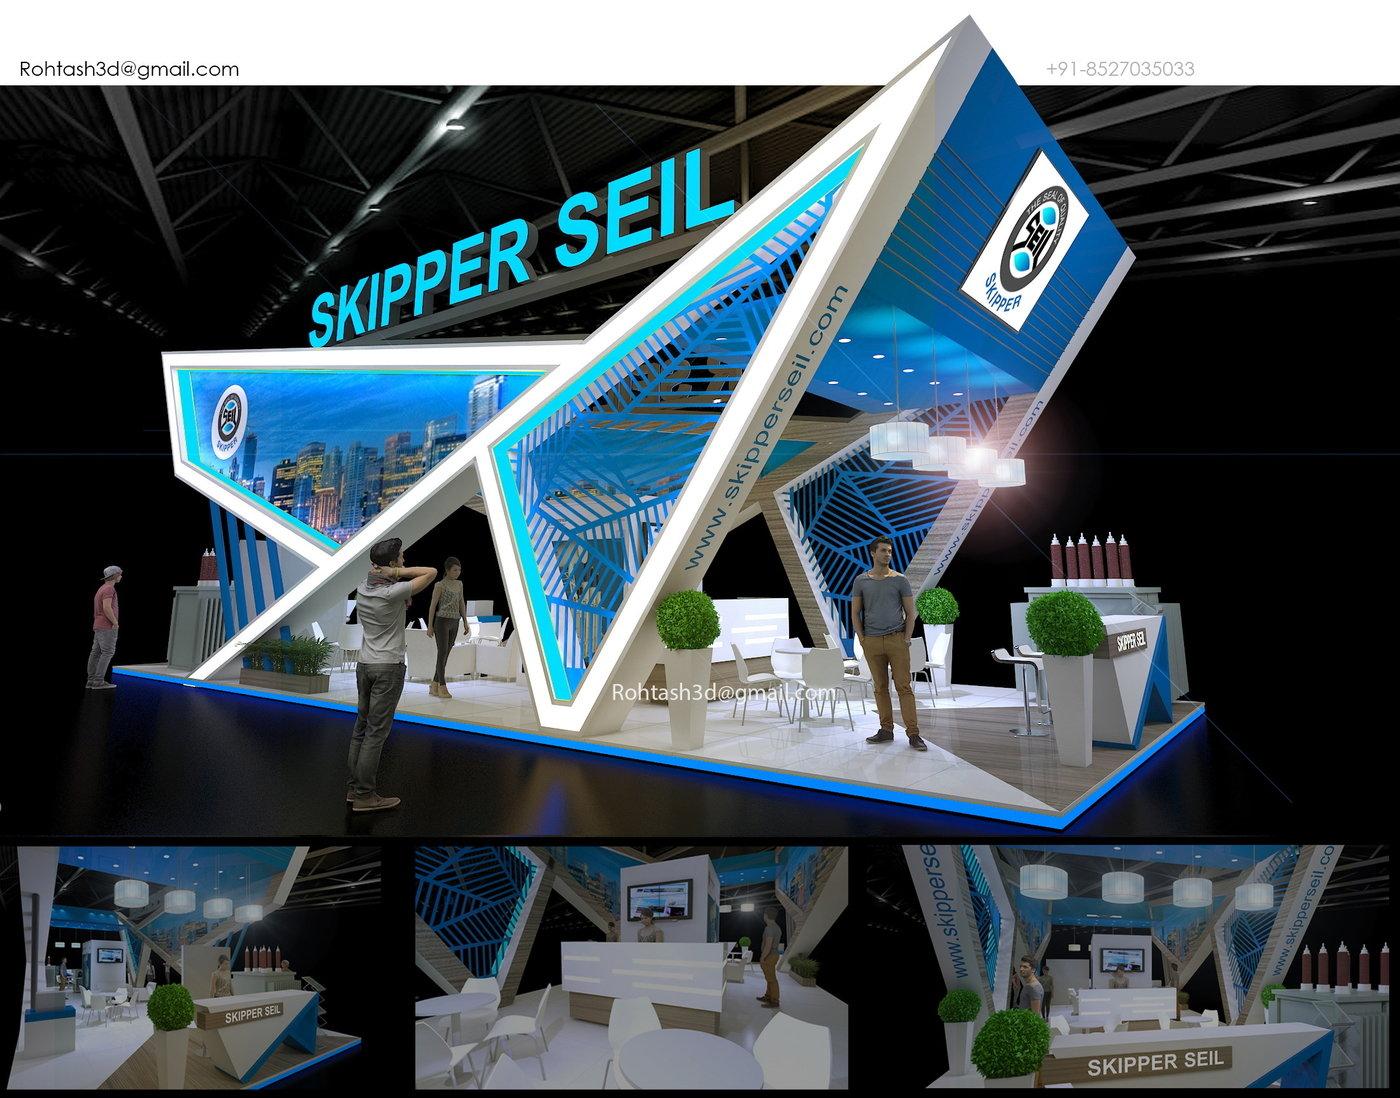 Food Exhibition Booth Design : Creative exhibition design idea by rohtash jangra at